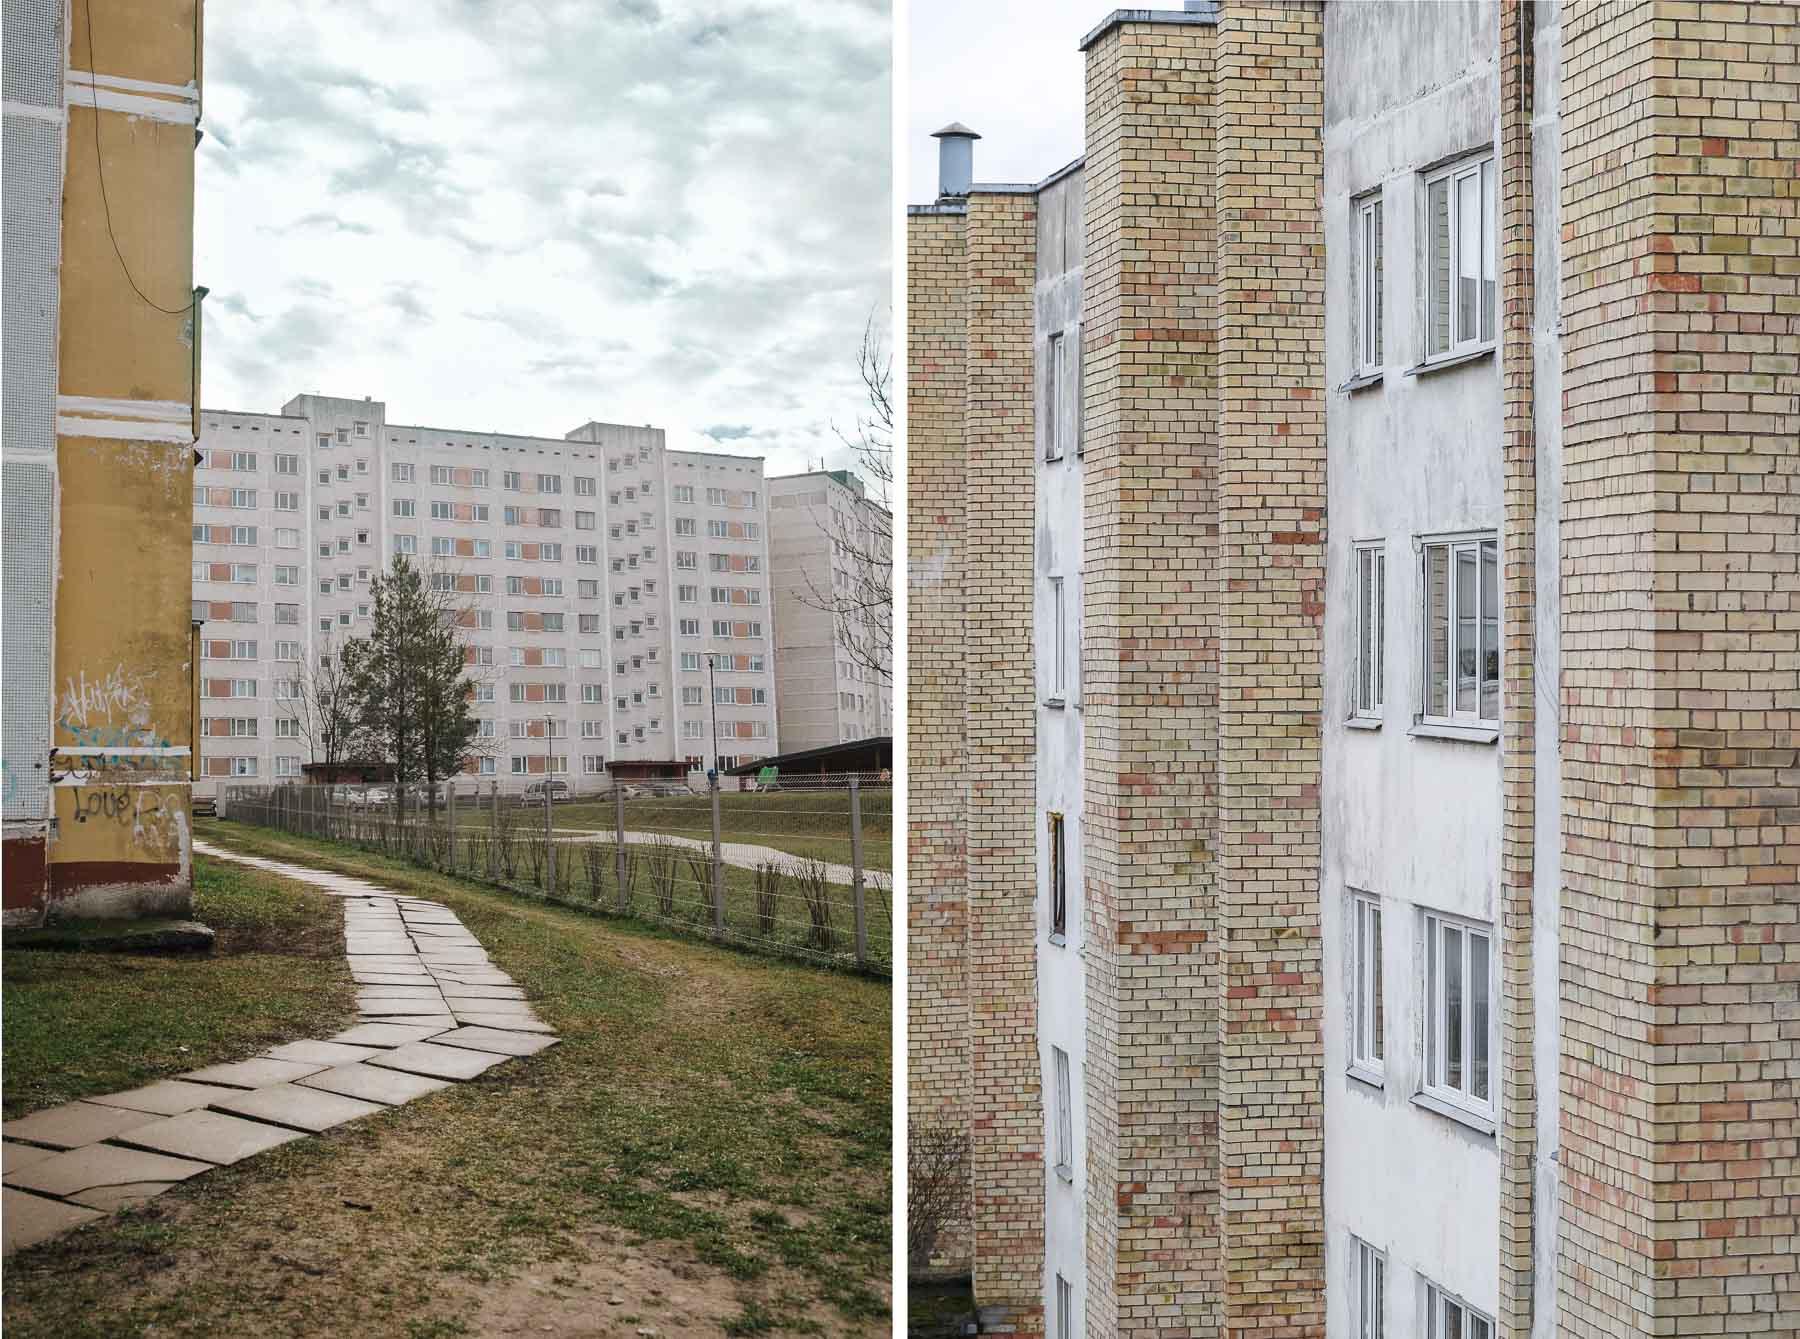 Landscape-cityscape-photography-jelgava-latvia-blocs-blocks-flat-post-soviet--Советские-квартиры-спальный-район-Латвия-город-фотограф-natalia-smith-photography-0111.jpg